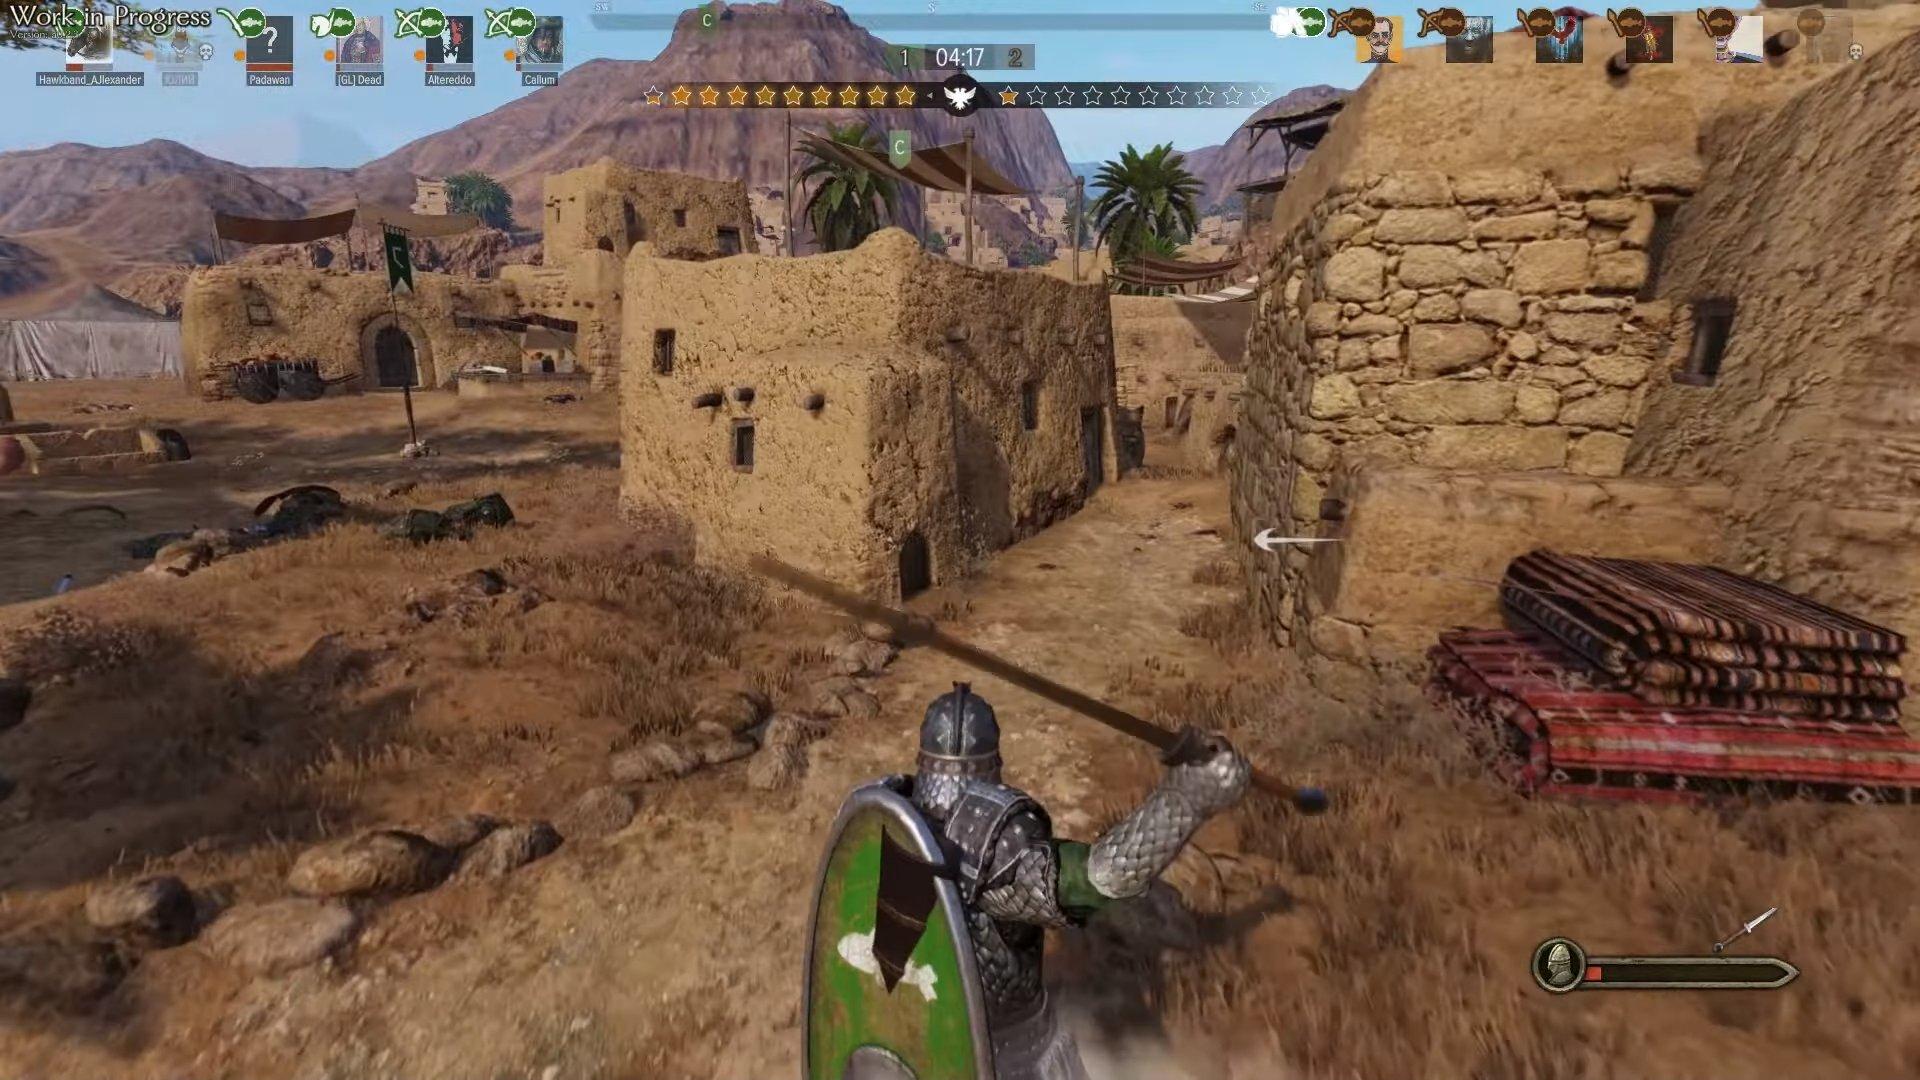 Mount & Blade II: Bannerlord gameplay